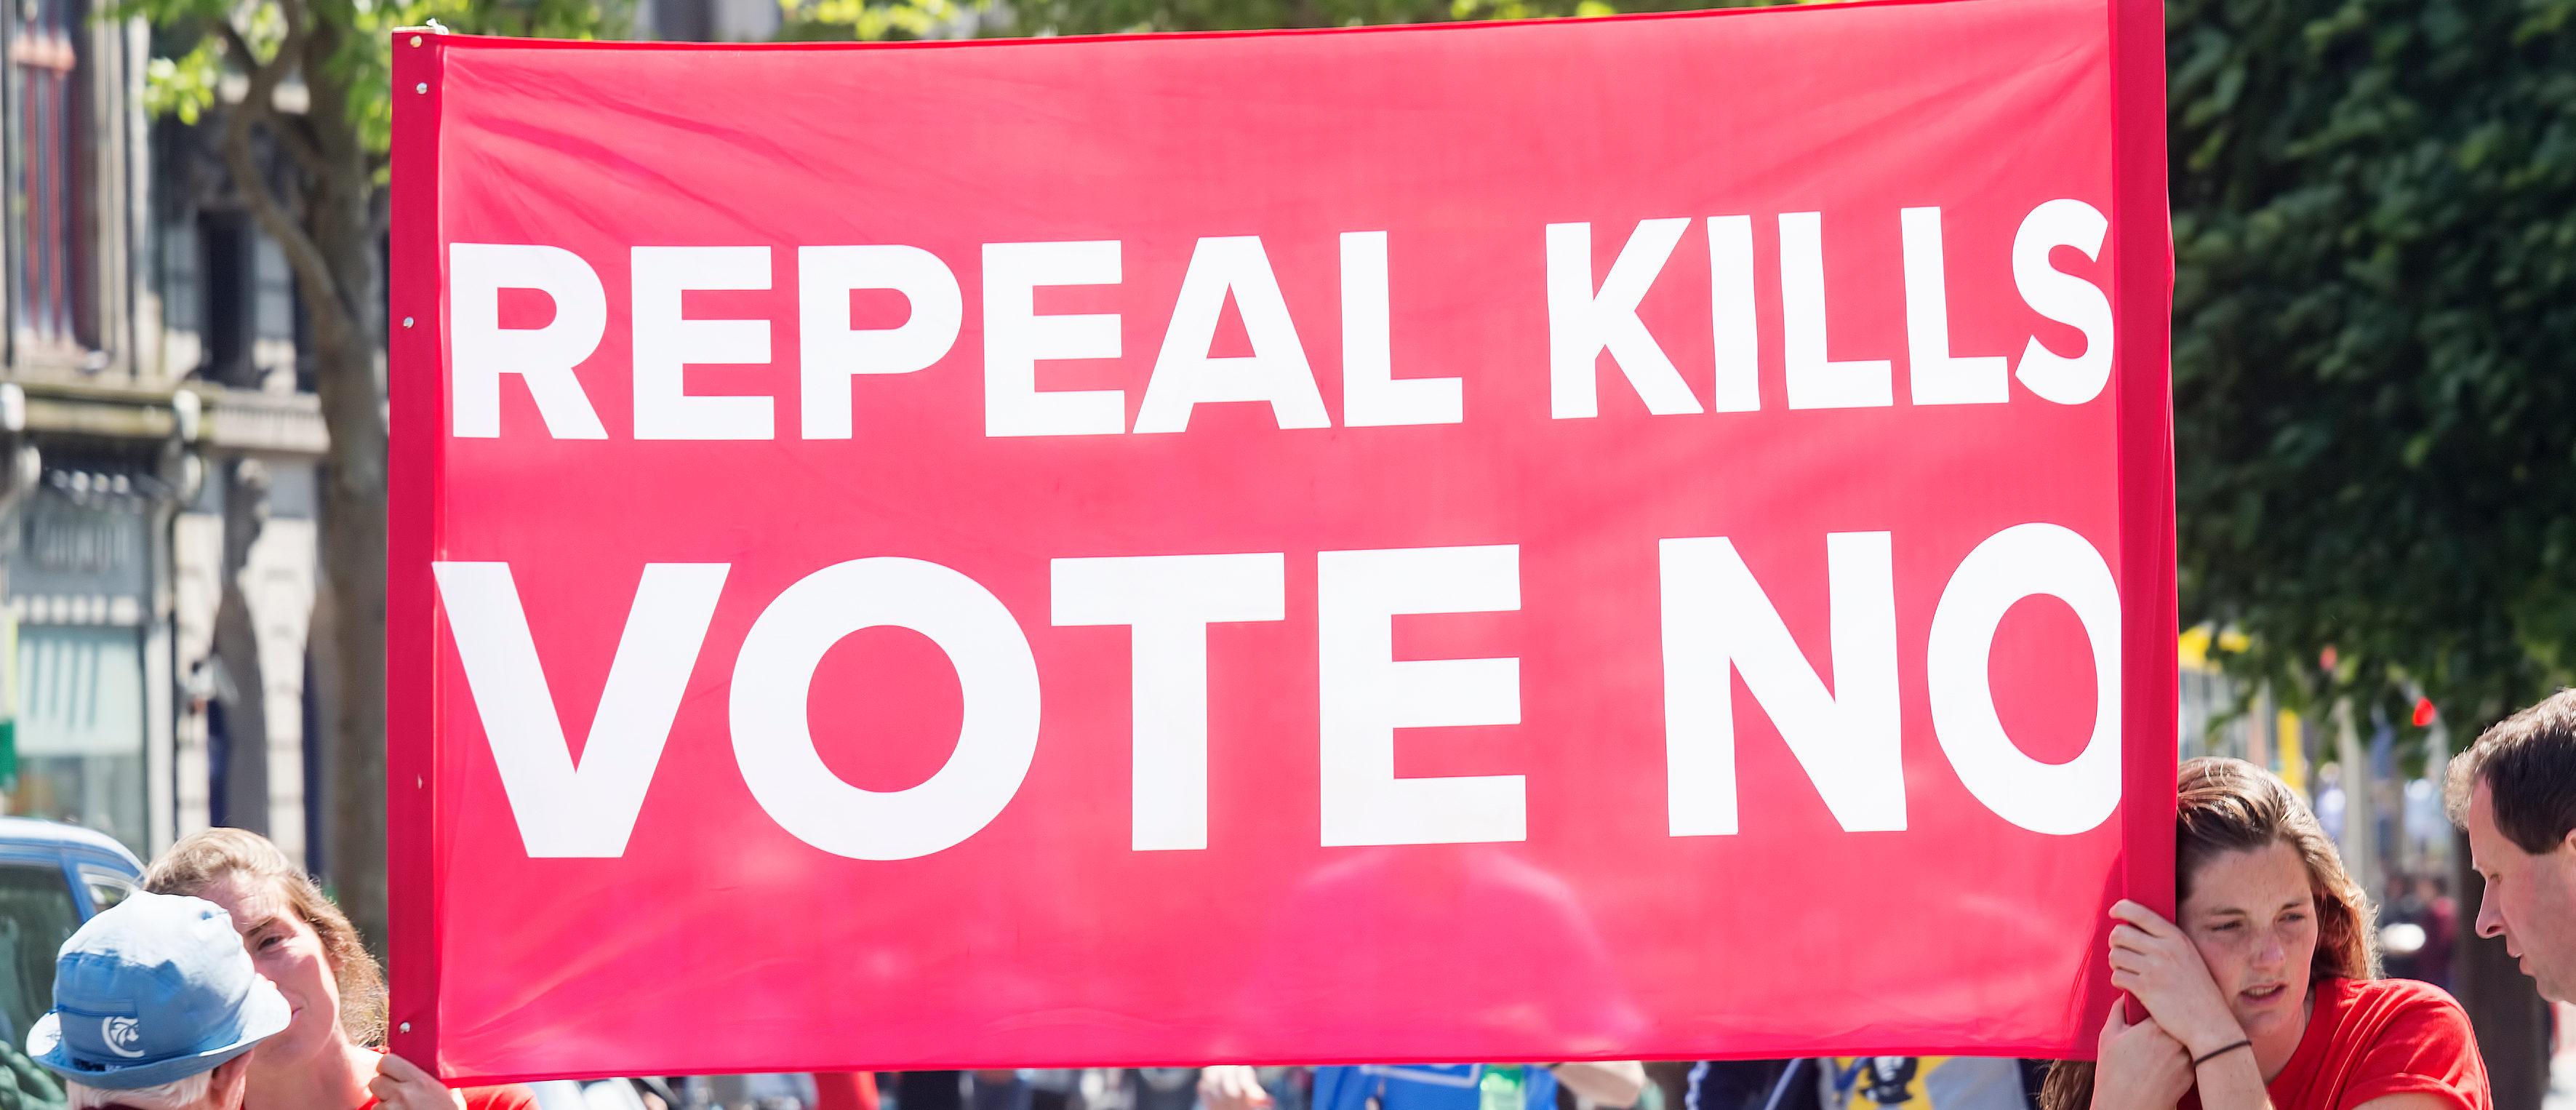 Irish Banner Opposing Abortion (Shutterstock/Bartosz Luczak)